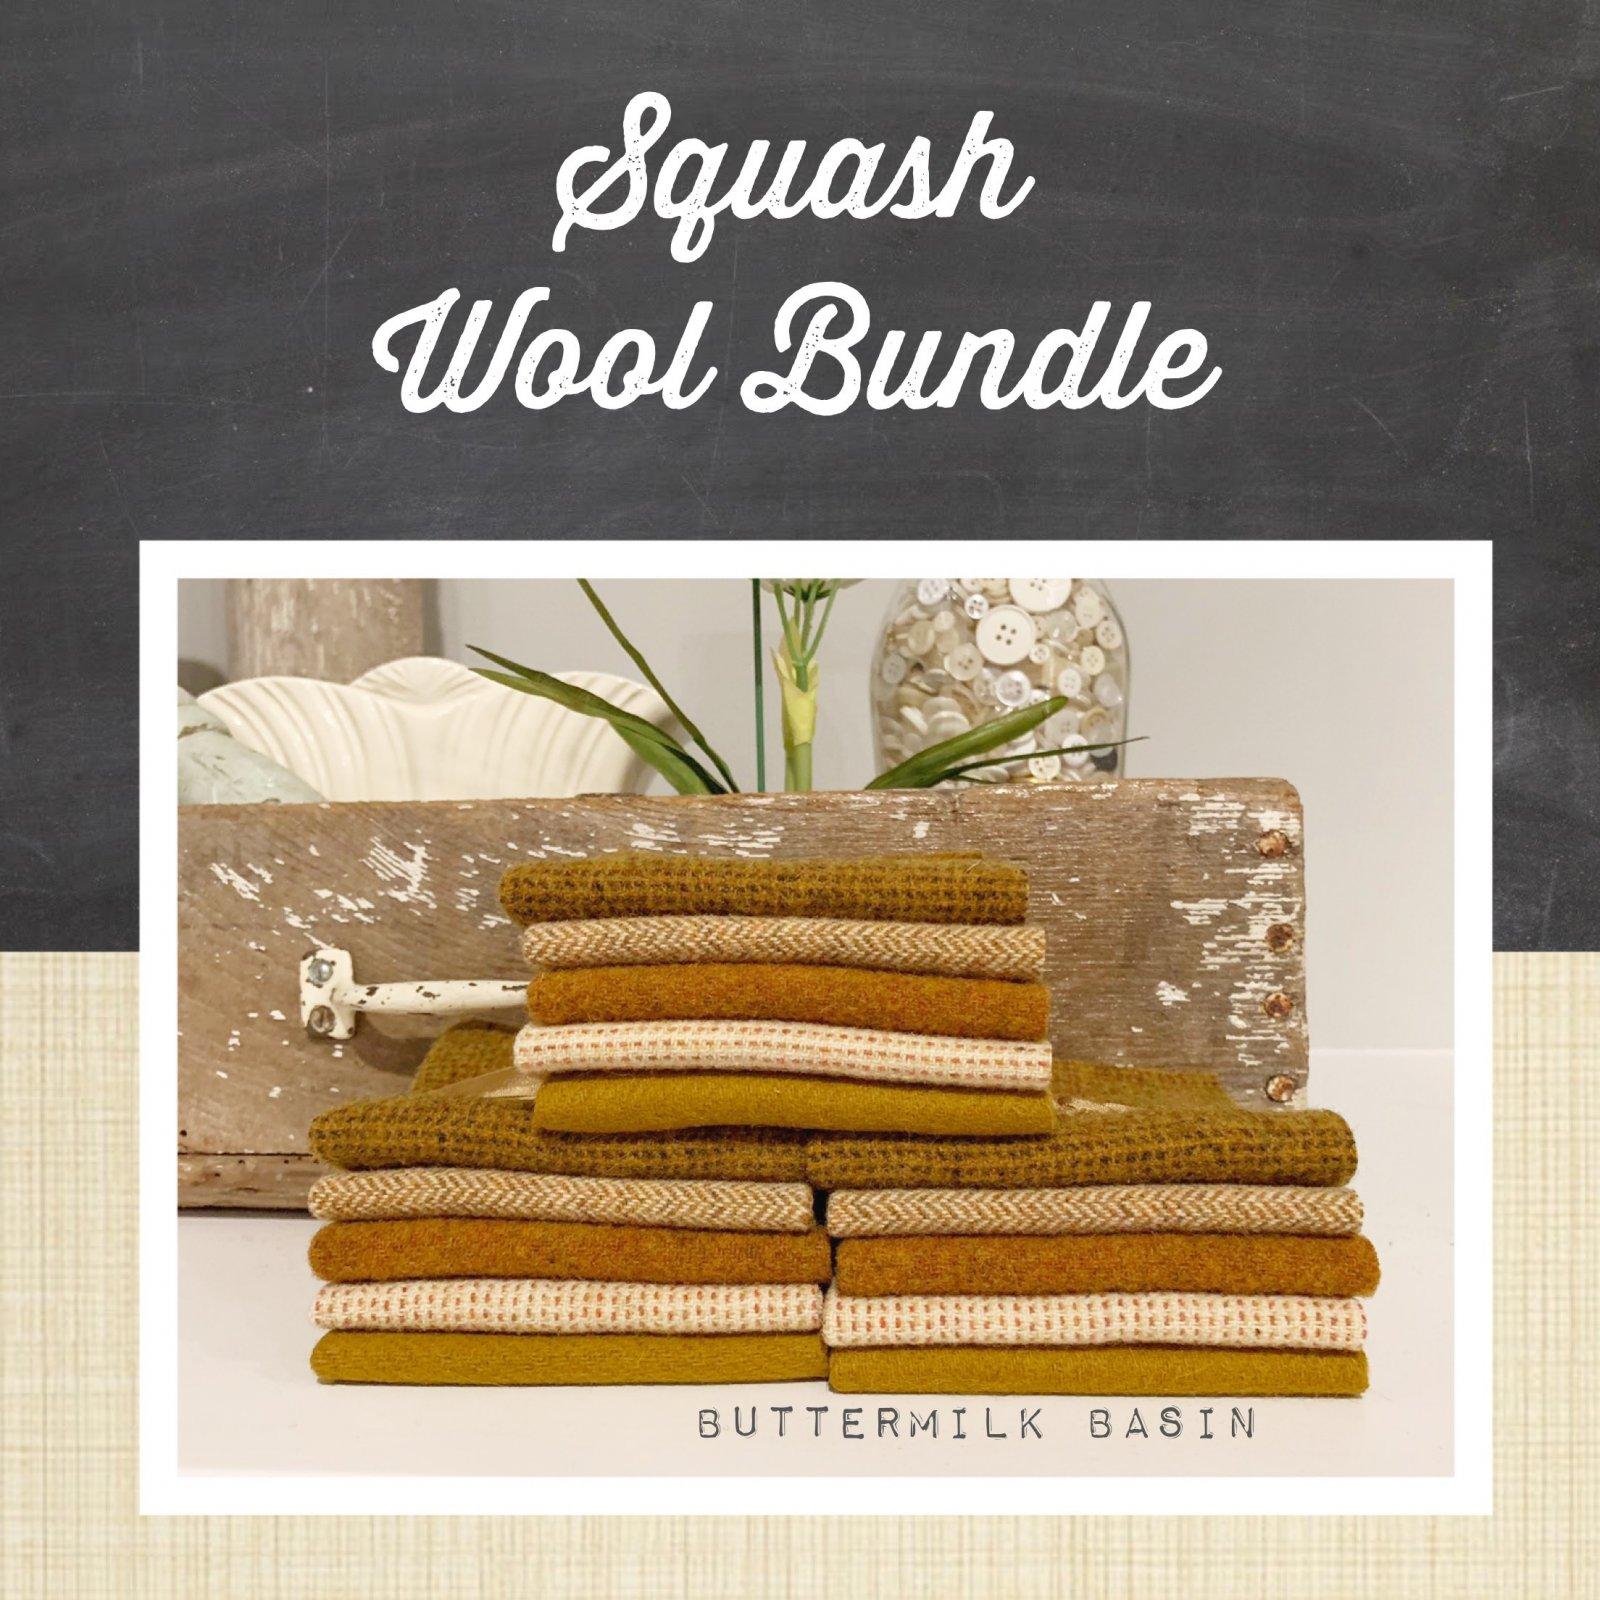 Squash Wool Bundle